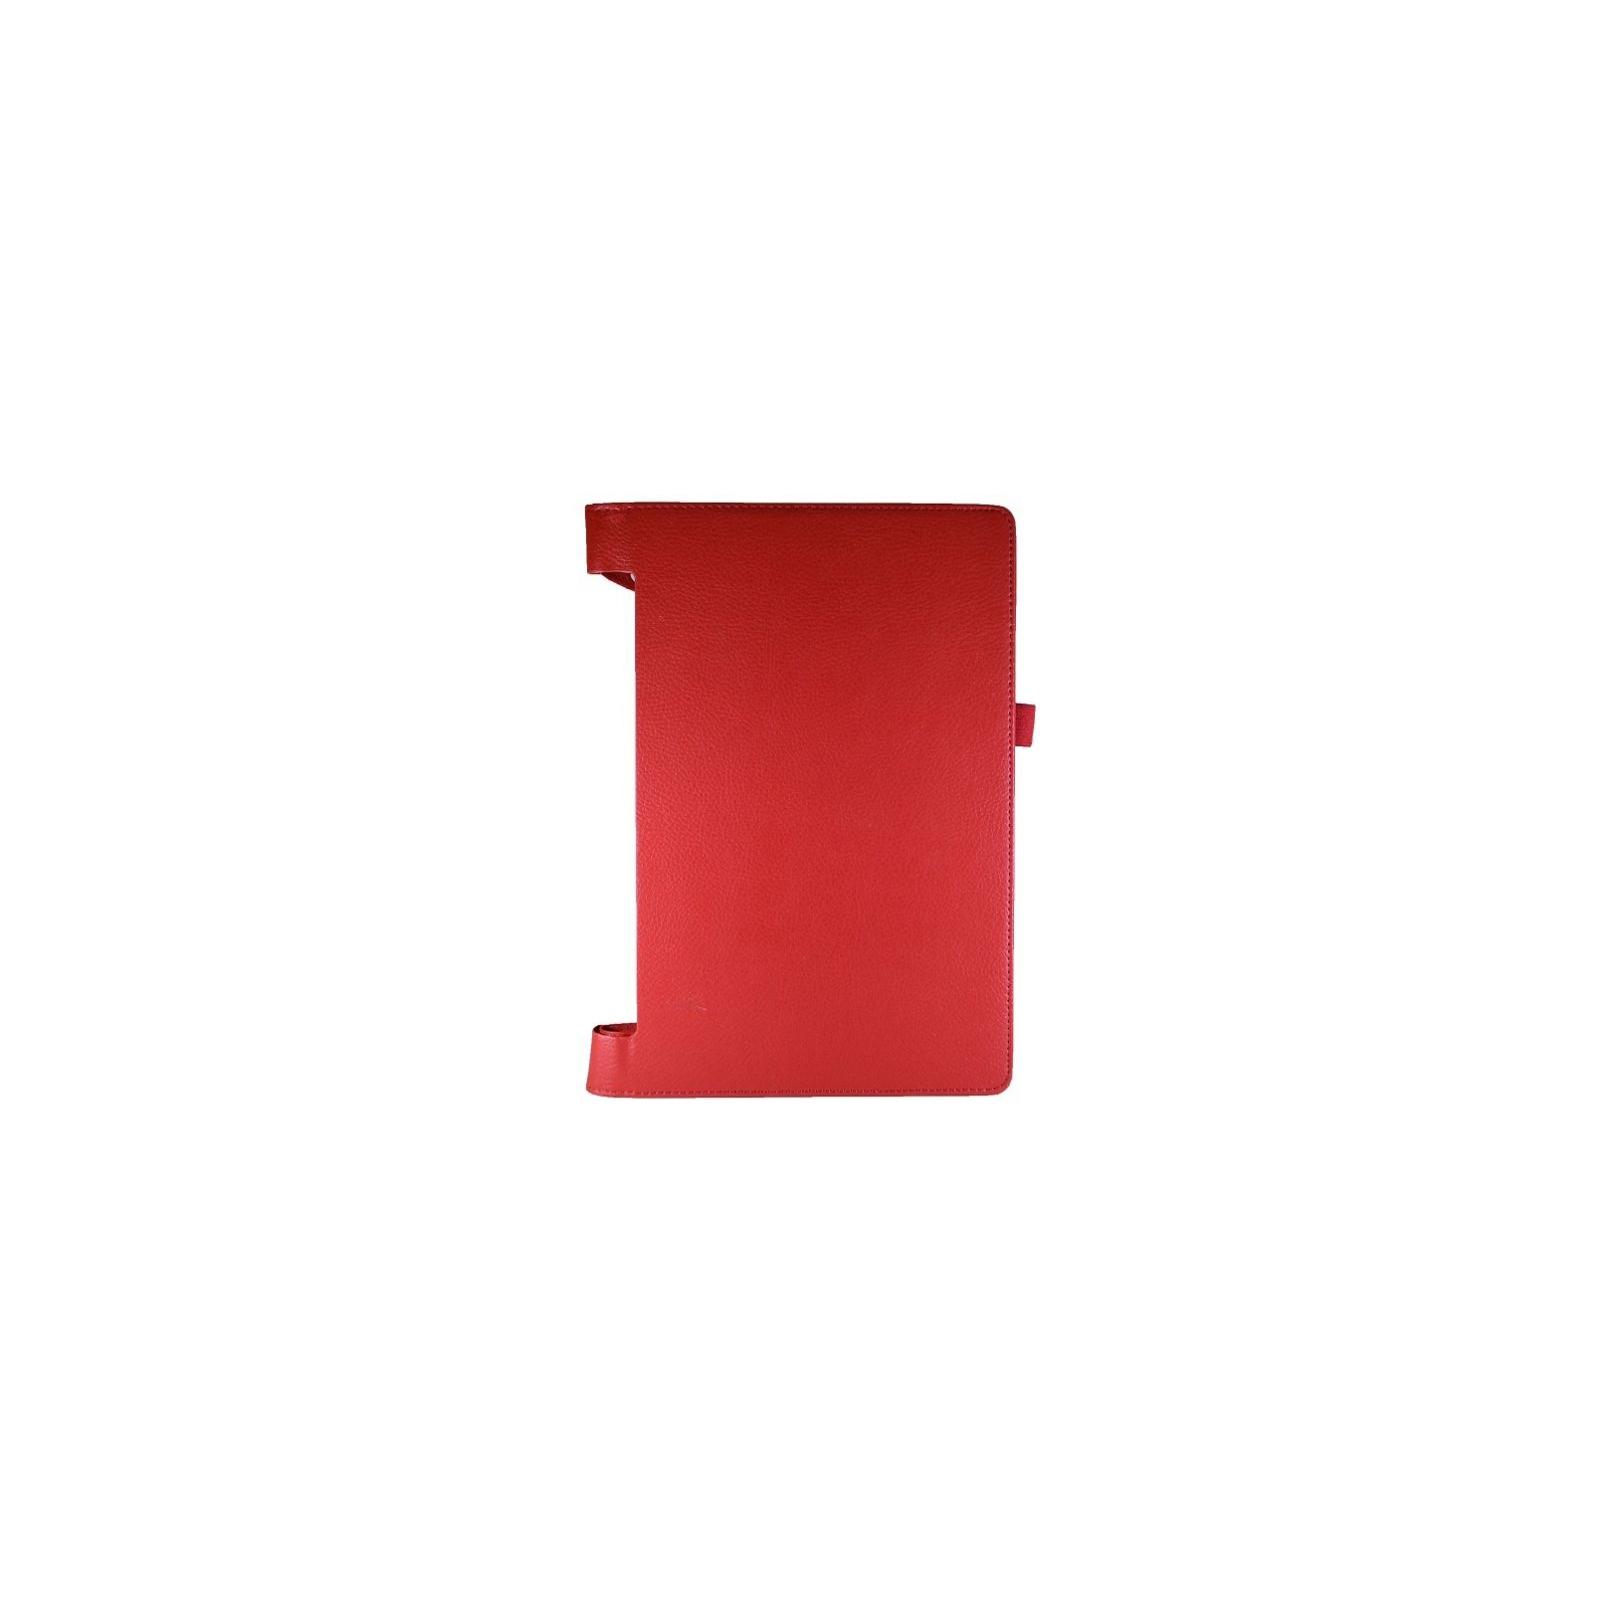 "Чехол для планшета Pro-case 10,1"" Pro-case Lenovo B8080 red (B8080r)"